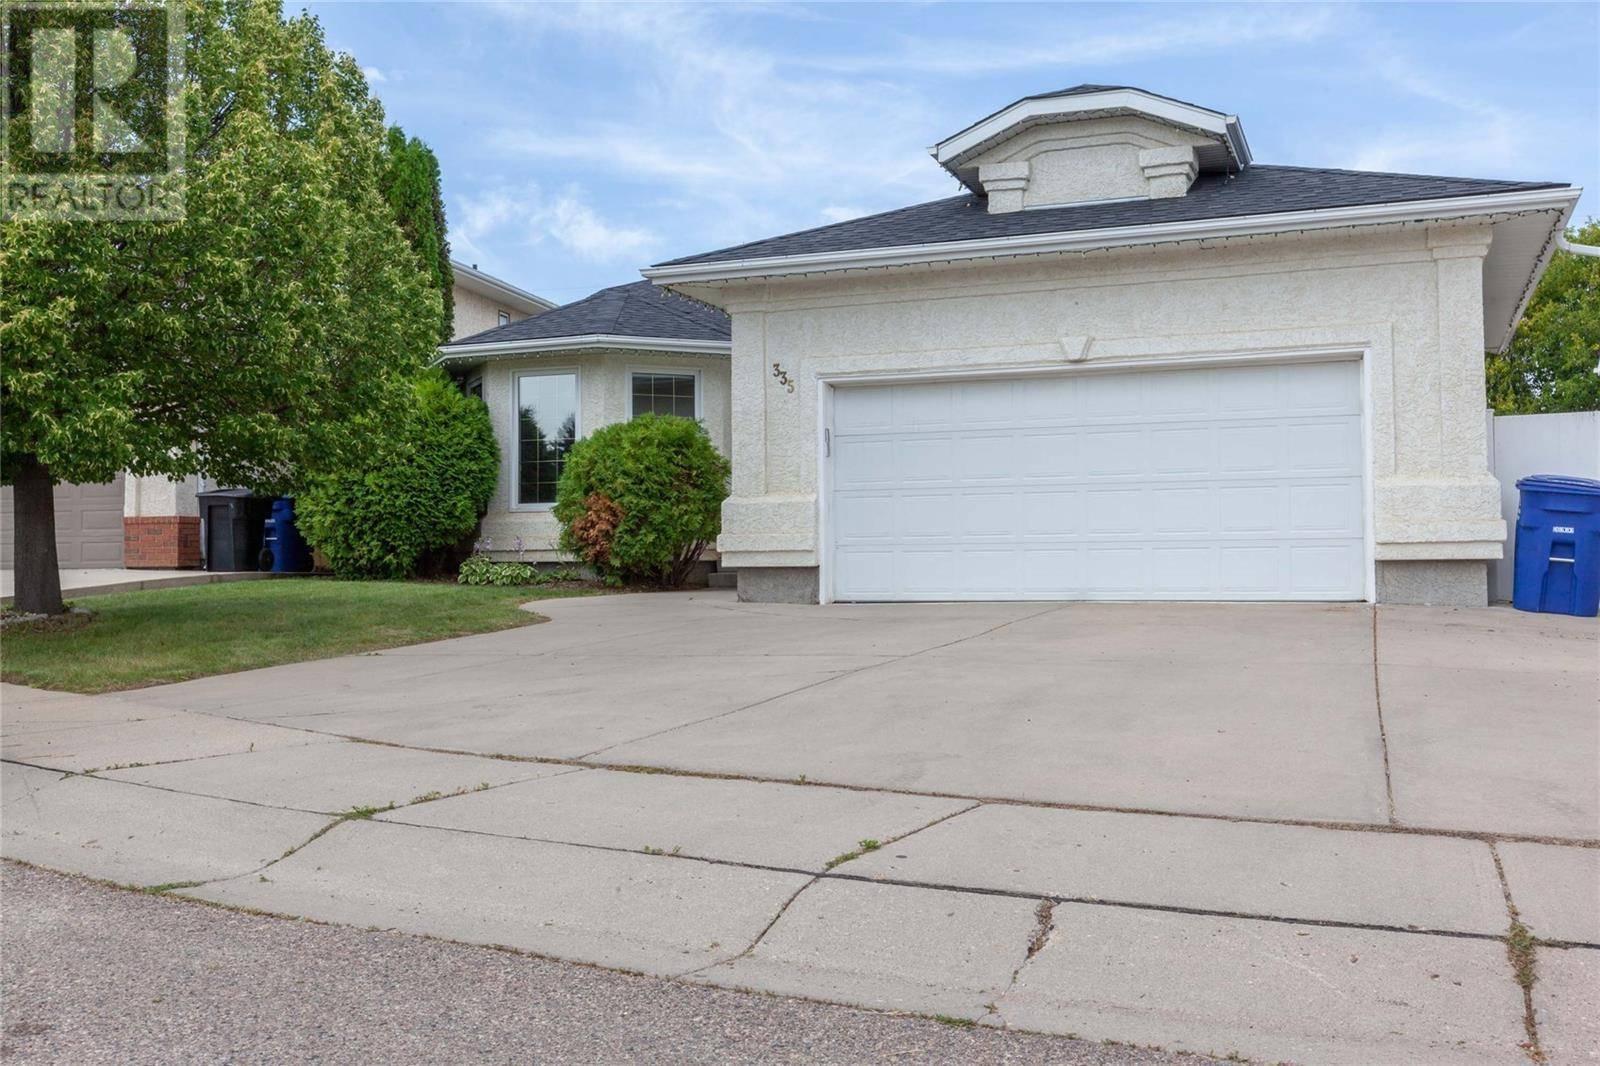 House for sale at 335 Blackthorn Cres Saskatoon Saskatchewan - MLS: SK782303